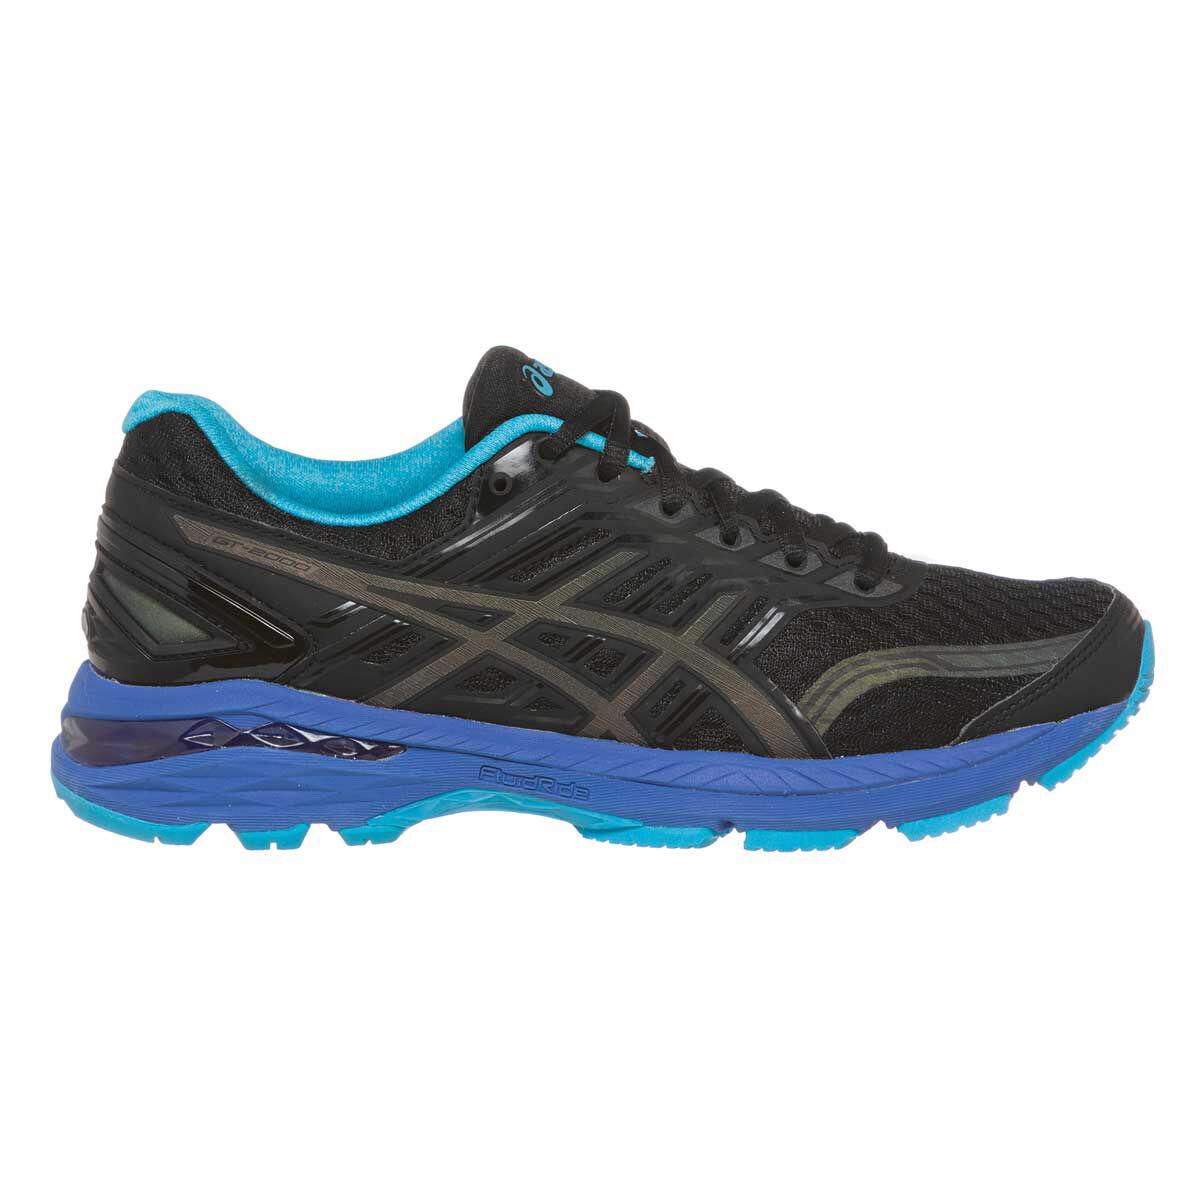 Asics GT 2000 5 Lite Show Womens Running Shoes Black / Blue US 7.5